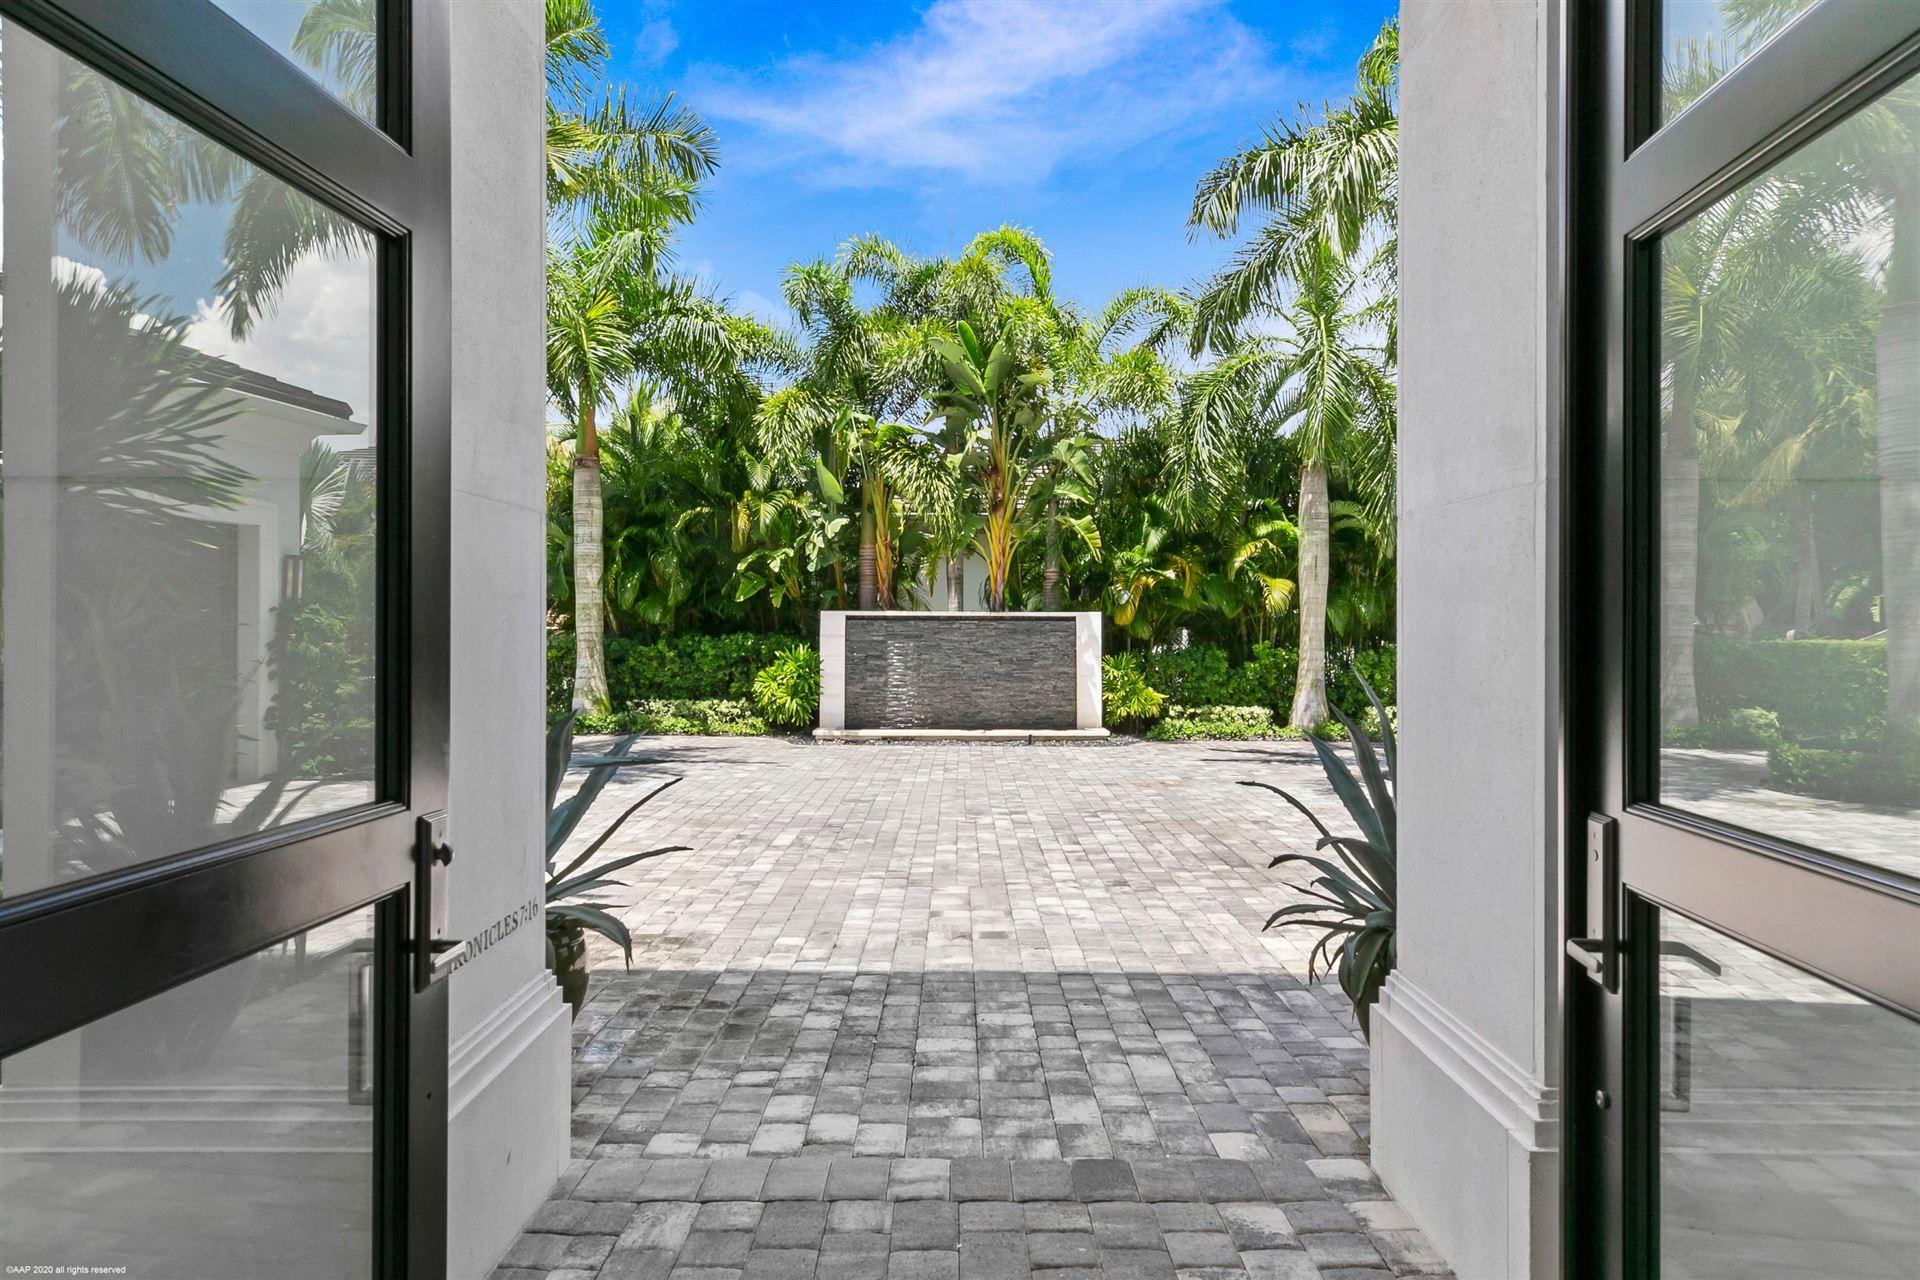 Photo of 12034 Corozo Court, Palm Beach Gardens, FL 33418 (MLS # RX-10638946)